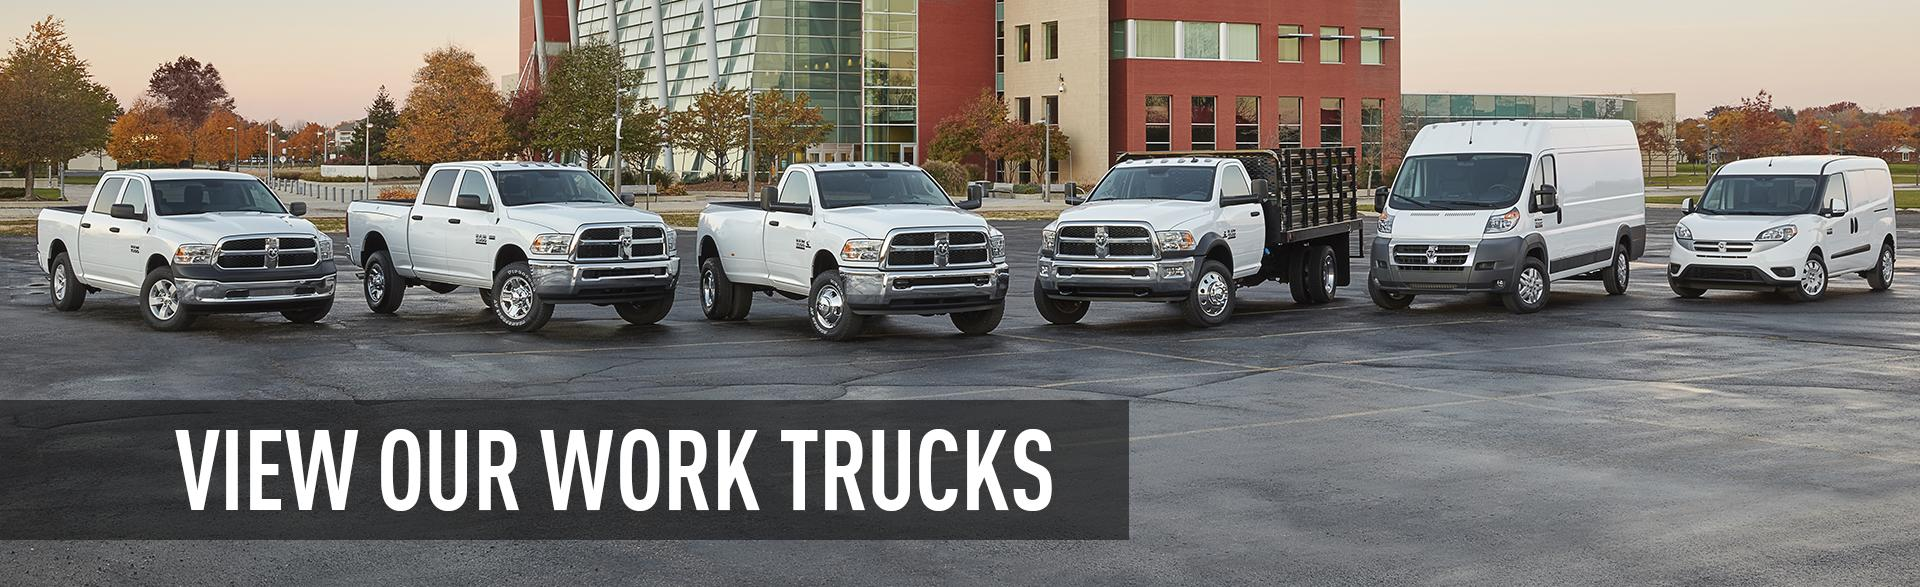 Work Trucks Banner